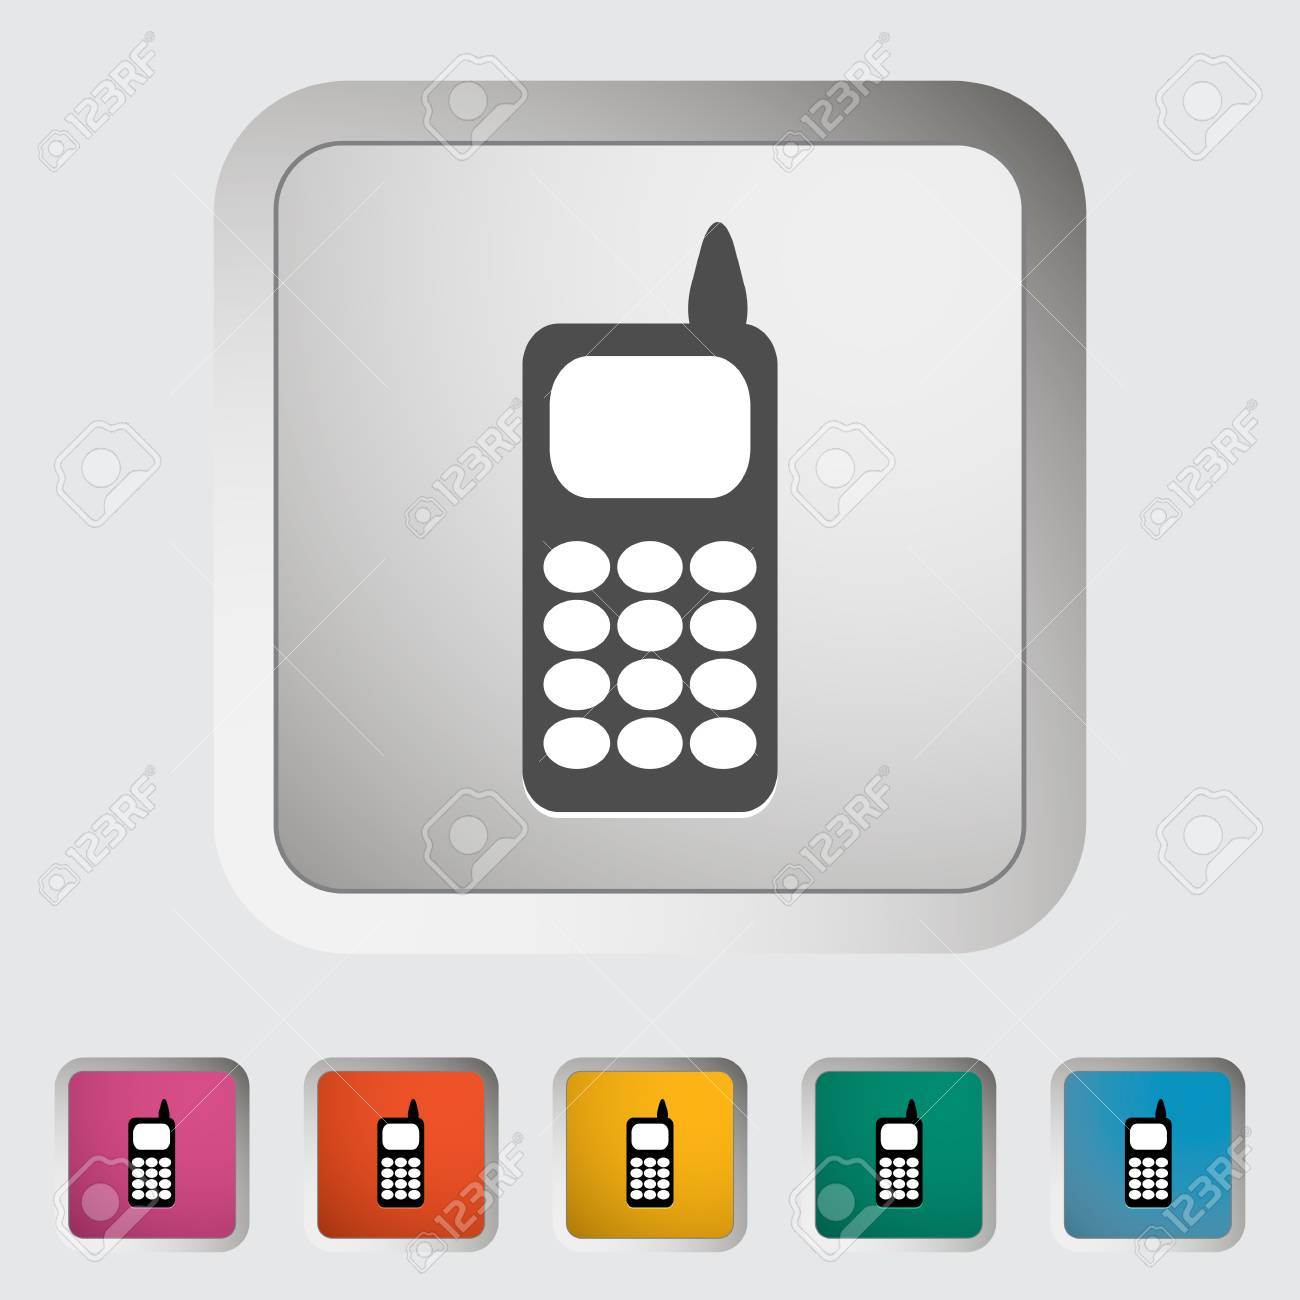 Phone single icon. Vector illustration. Stock Vector - 18564077